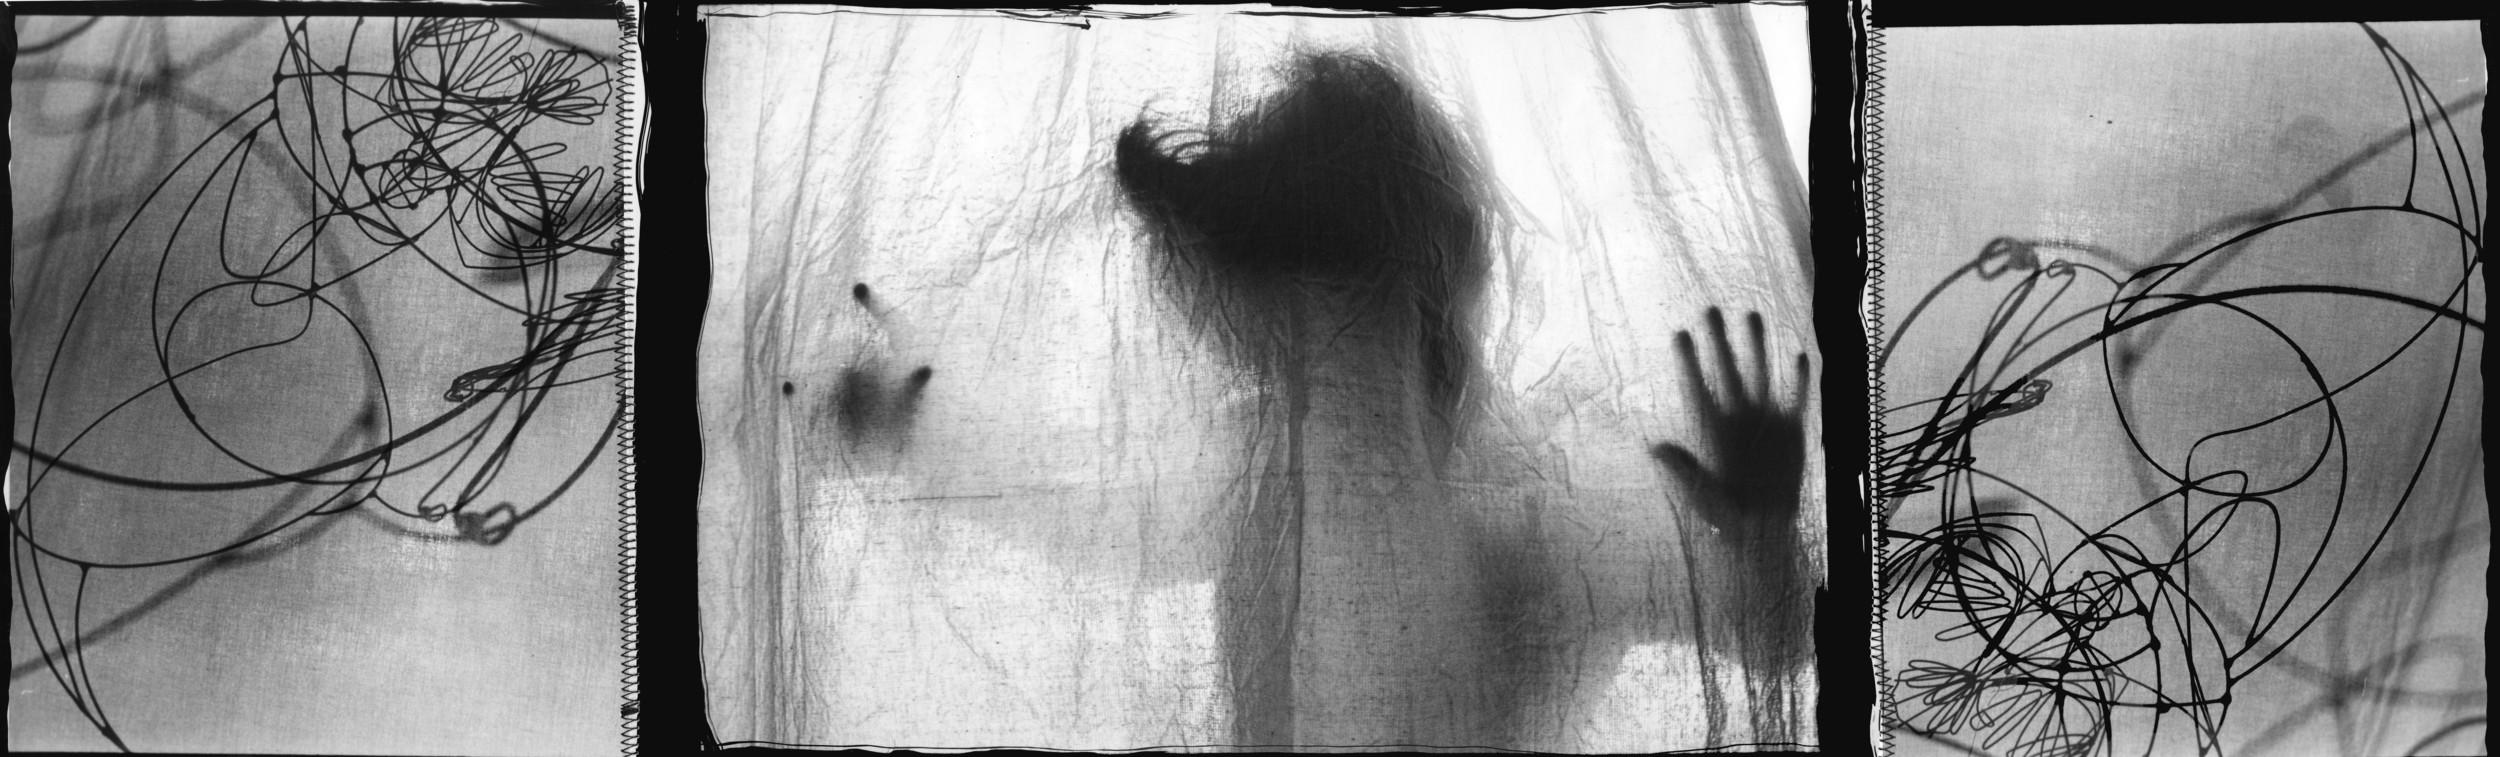 behind-the-curtain_triptych.jpg